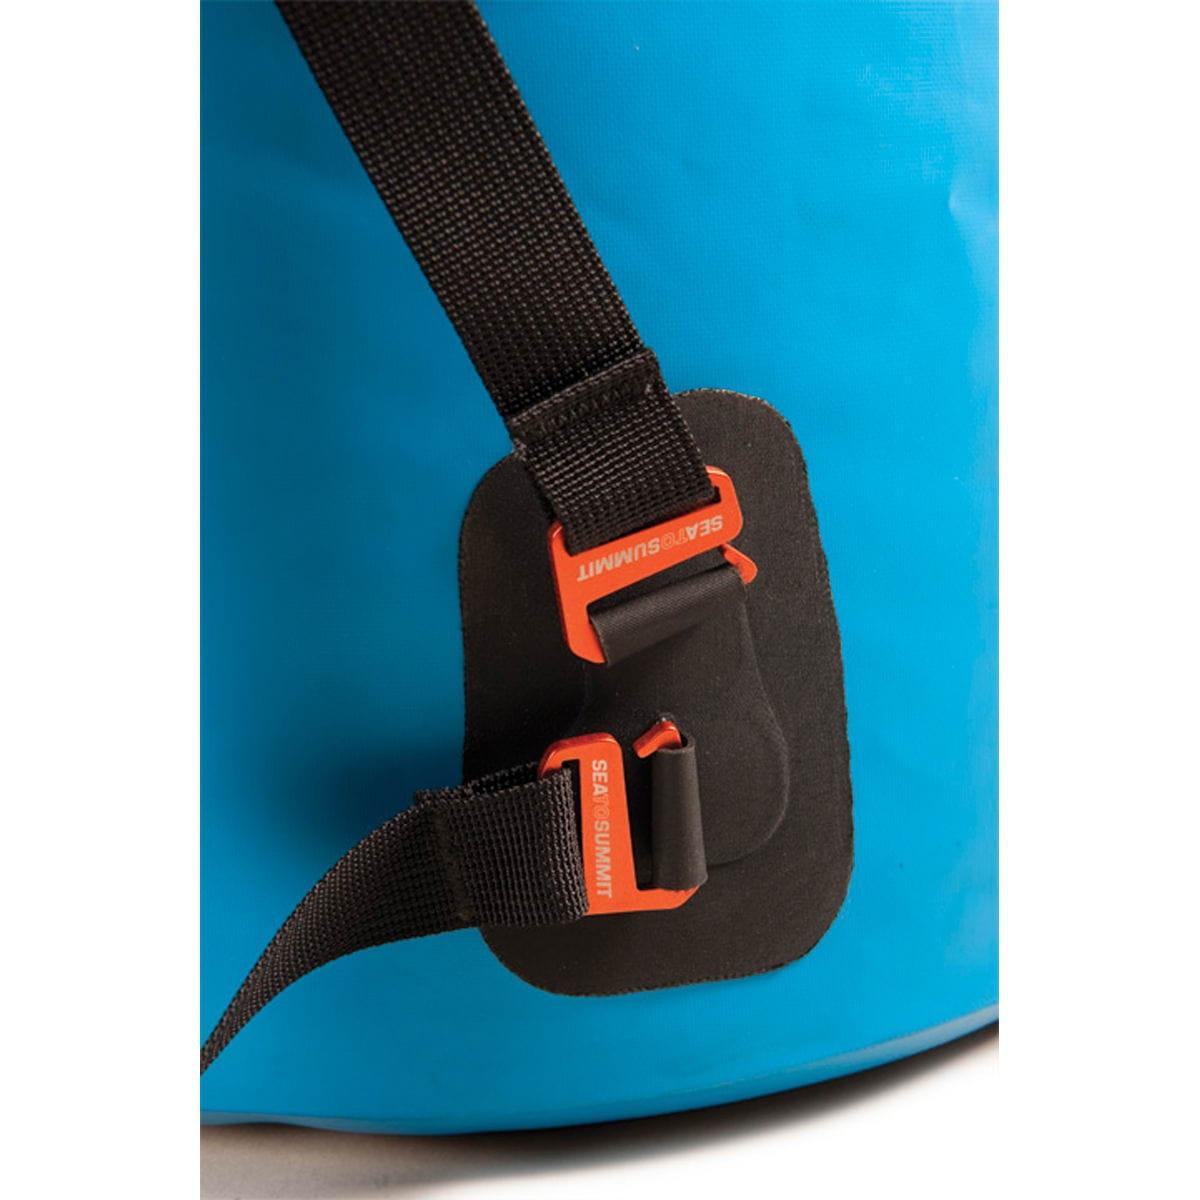 Sea to Summit Hydraulic Dry Pack - 120 Liter - Packsack - Bild 3